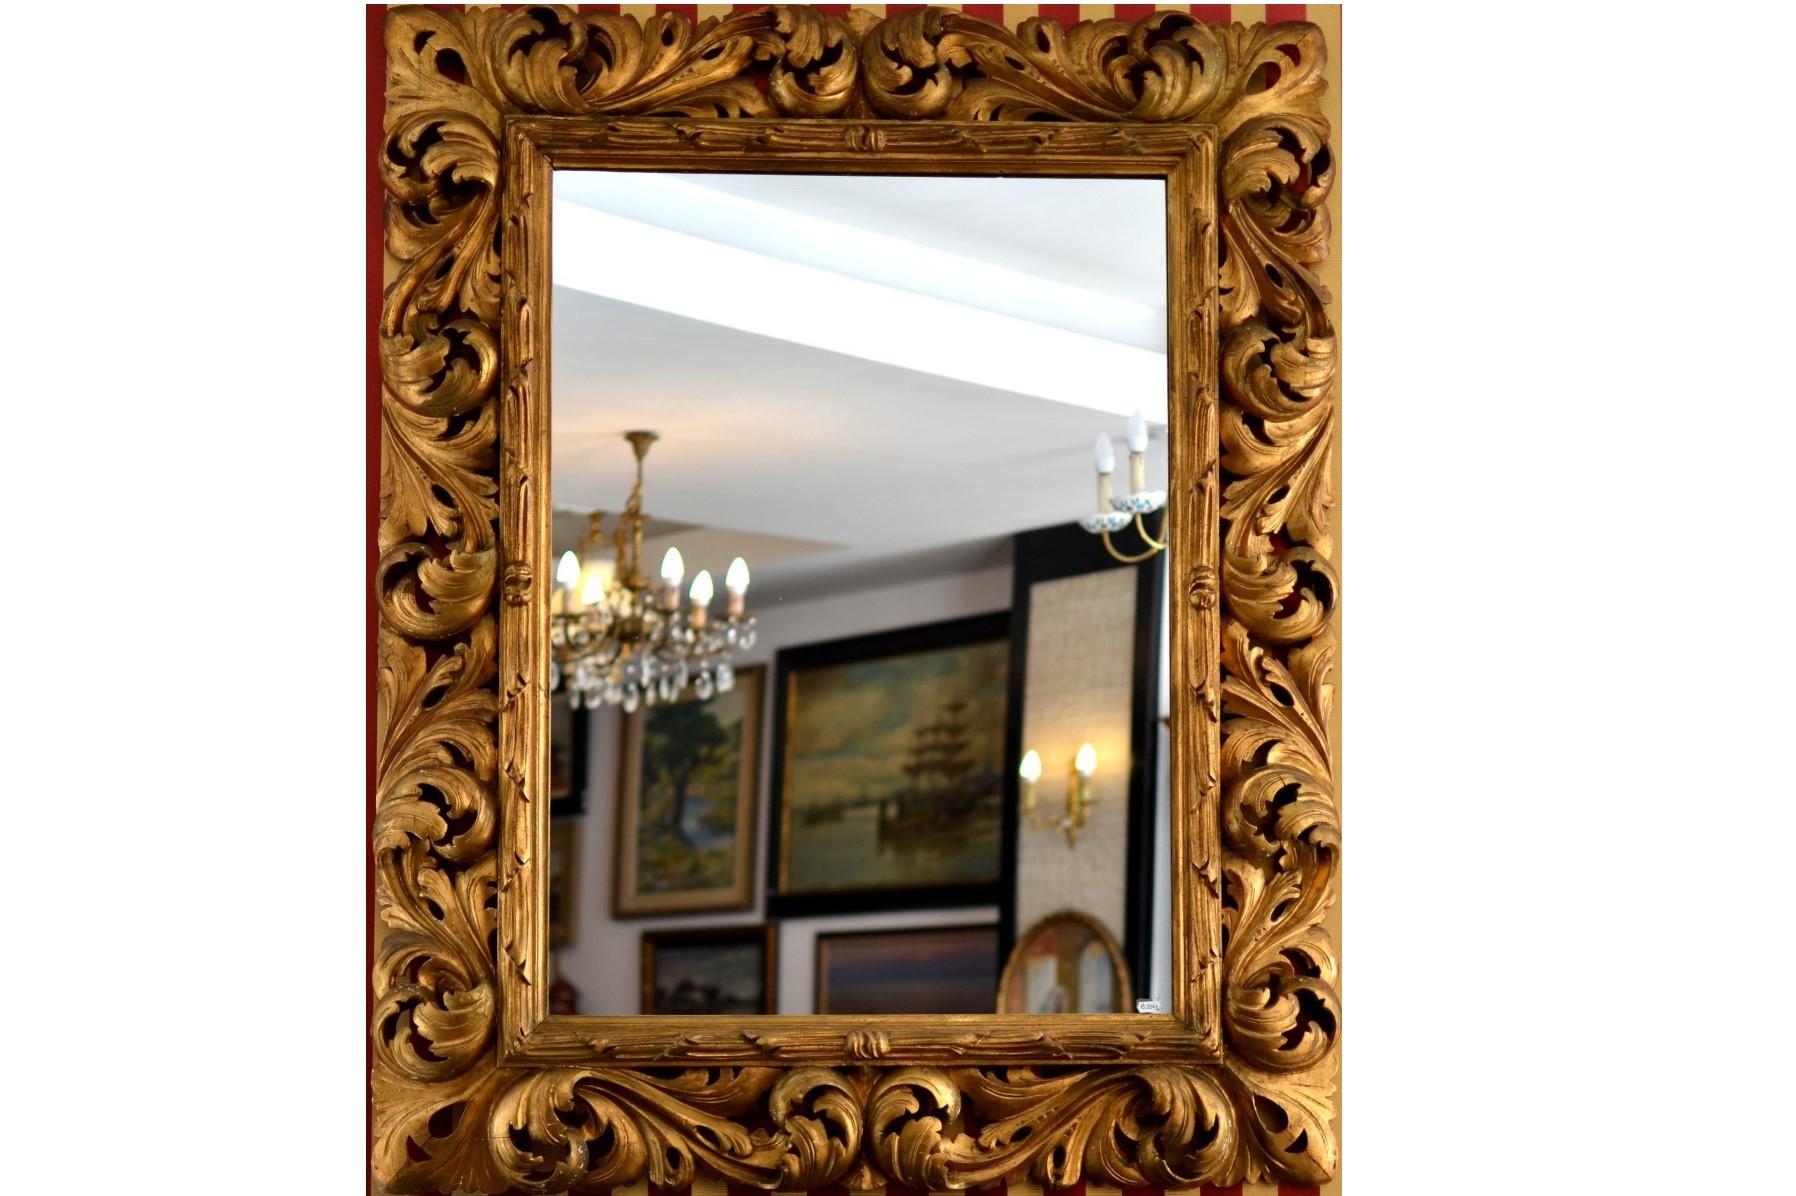 Oglinda florentina sec XIX